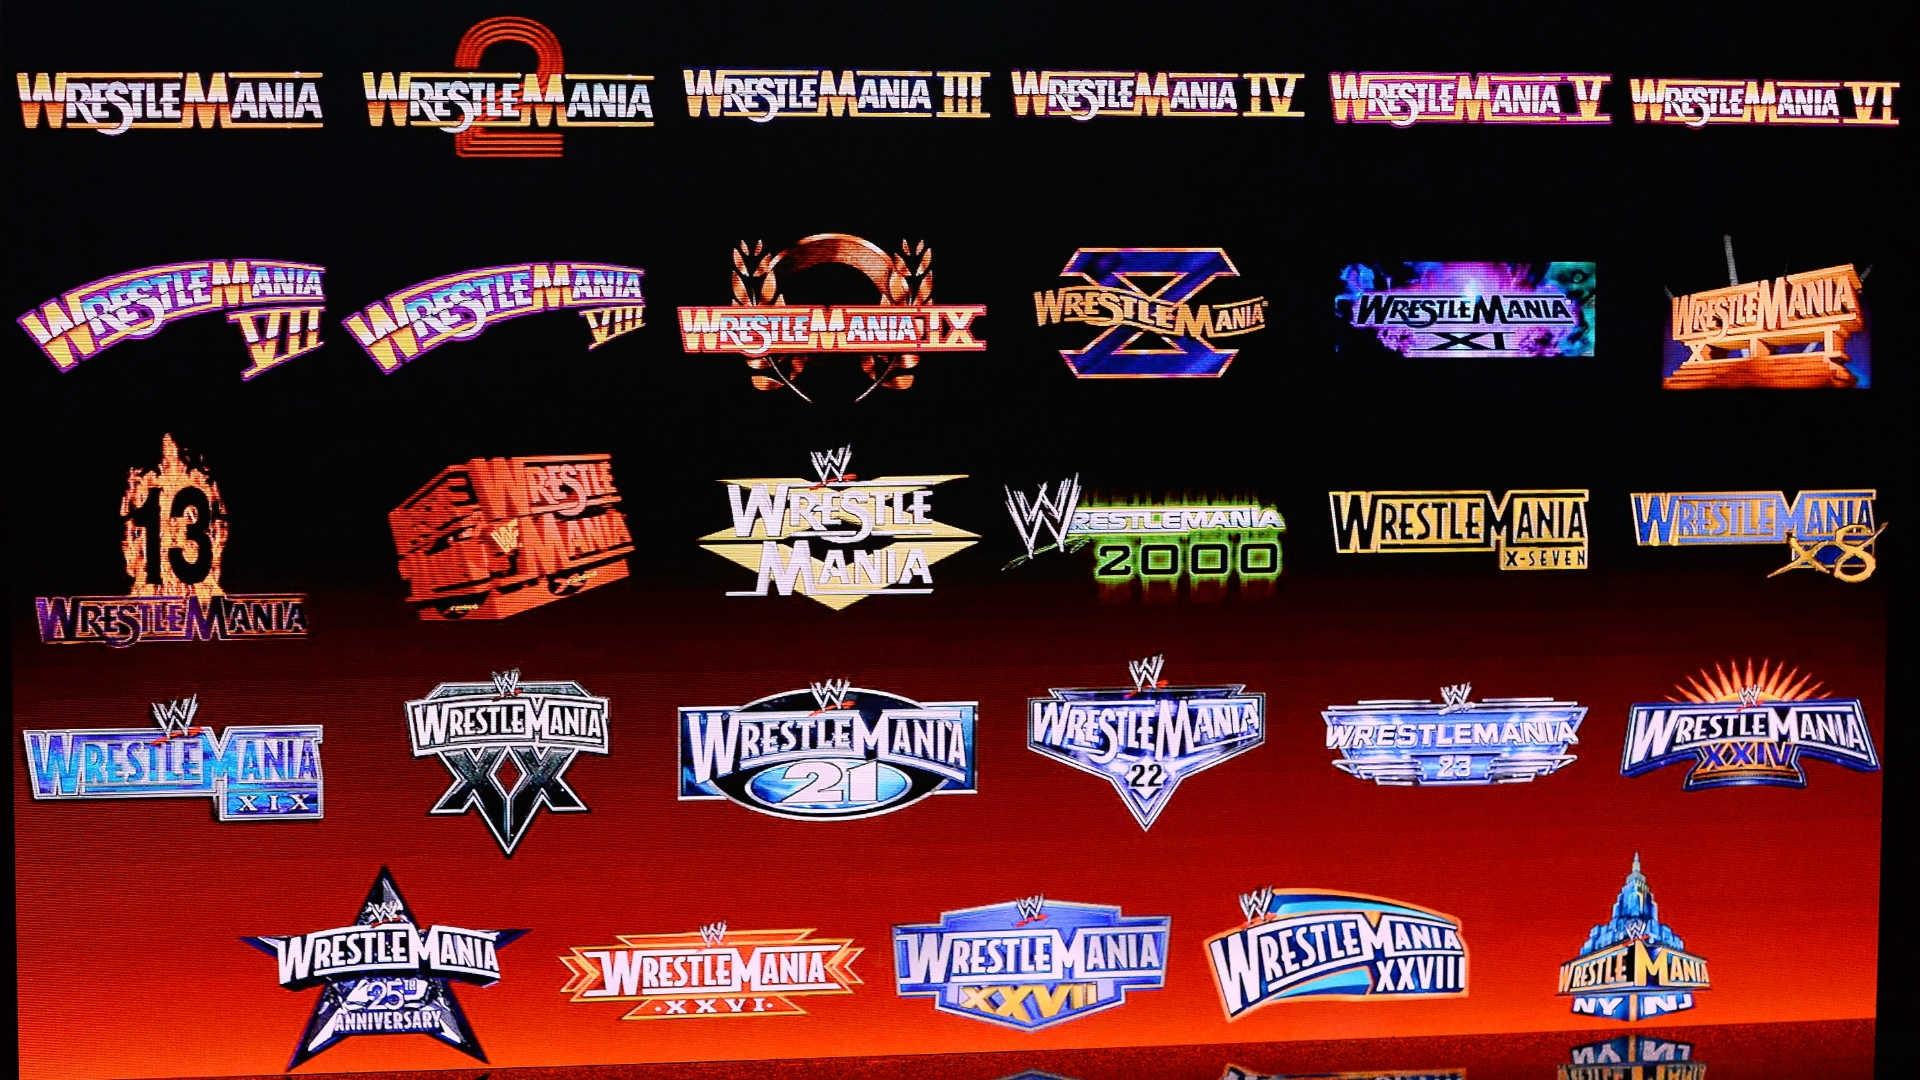 Wrestlemania date in Australia